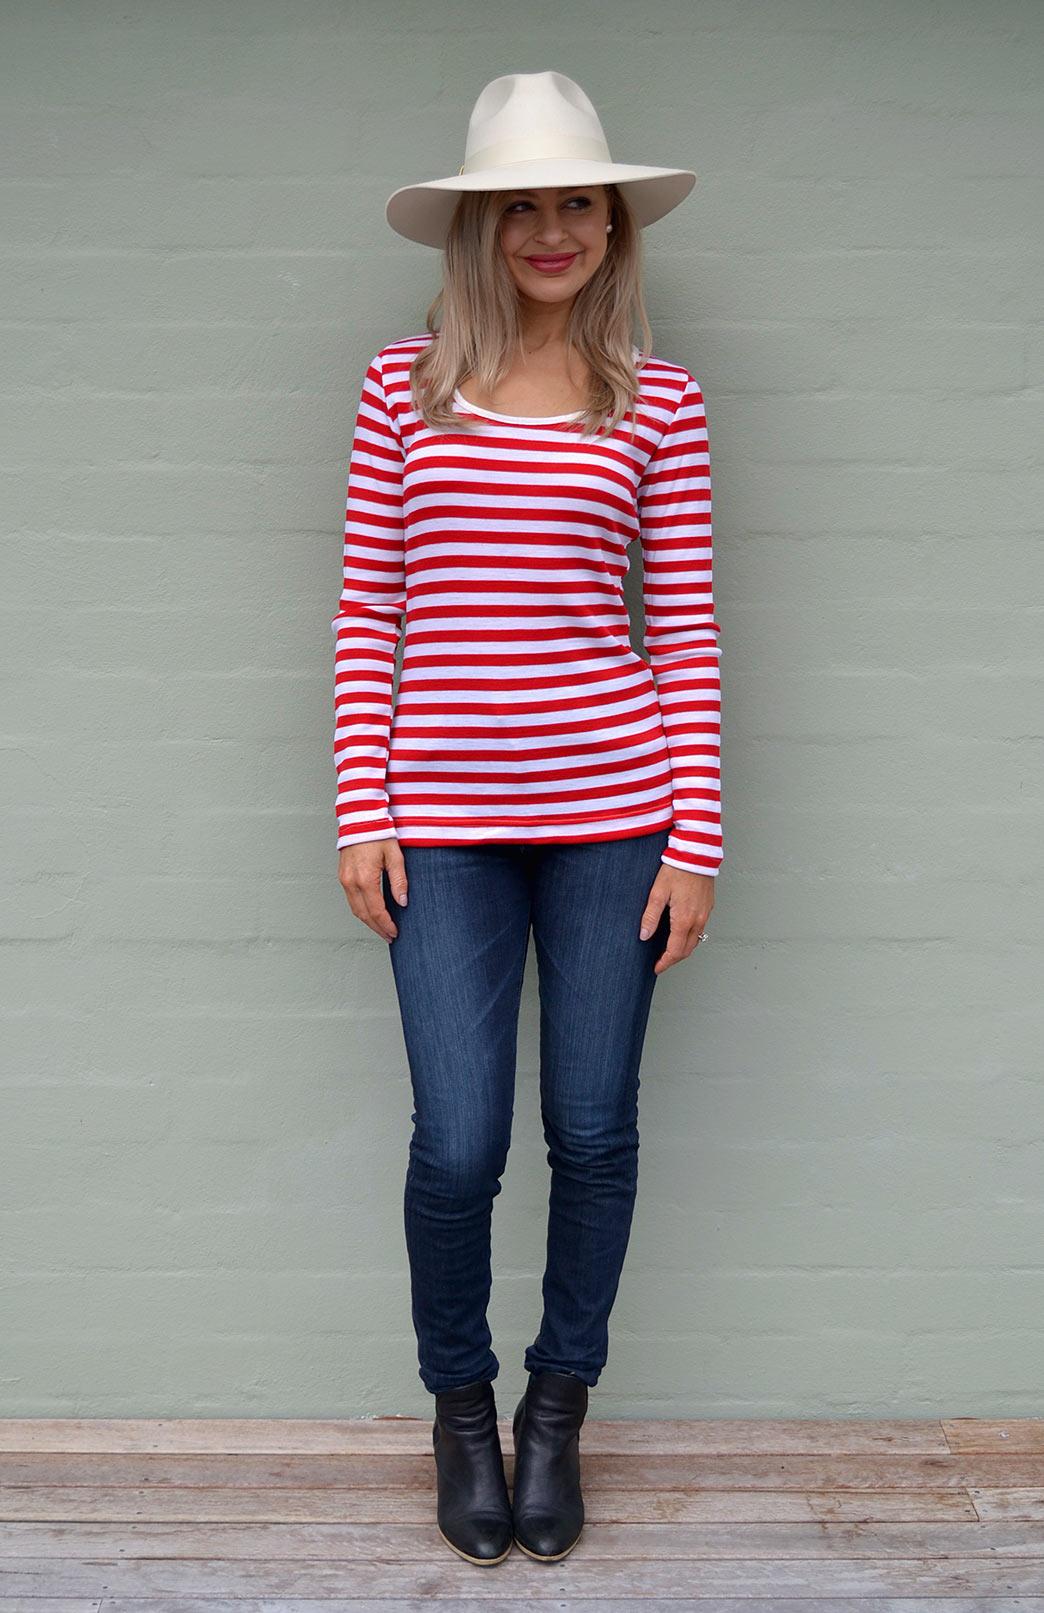 Scoop Neck Top - Rib Fabric - Women's Striped Merino Wool Long Sleeve Top - Smitten Merino Tasmania Australia